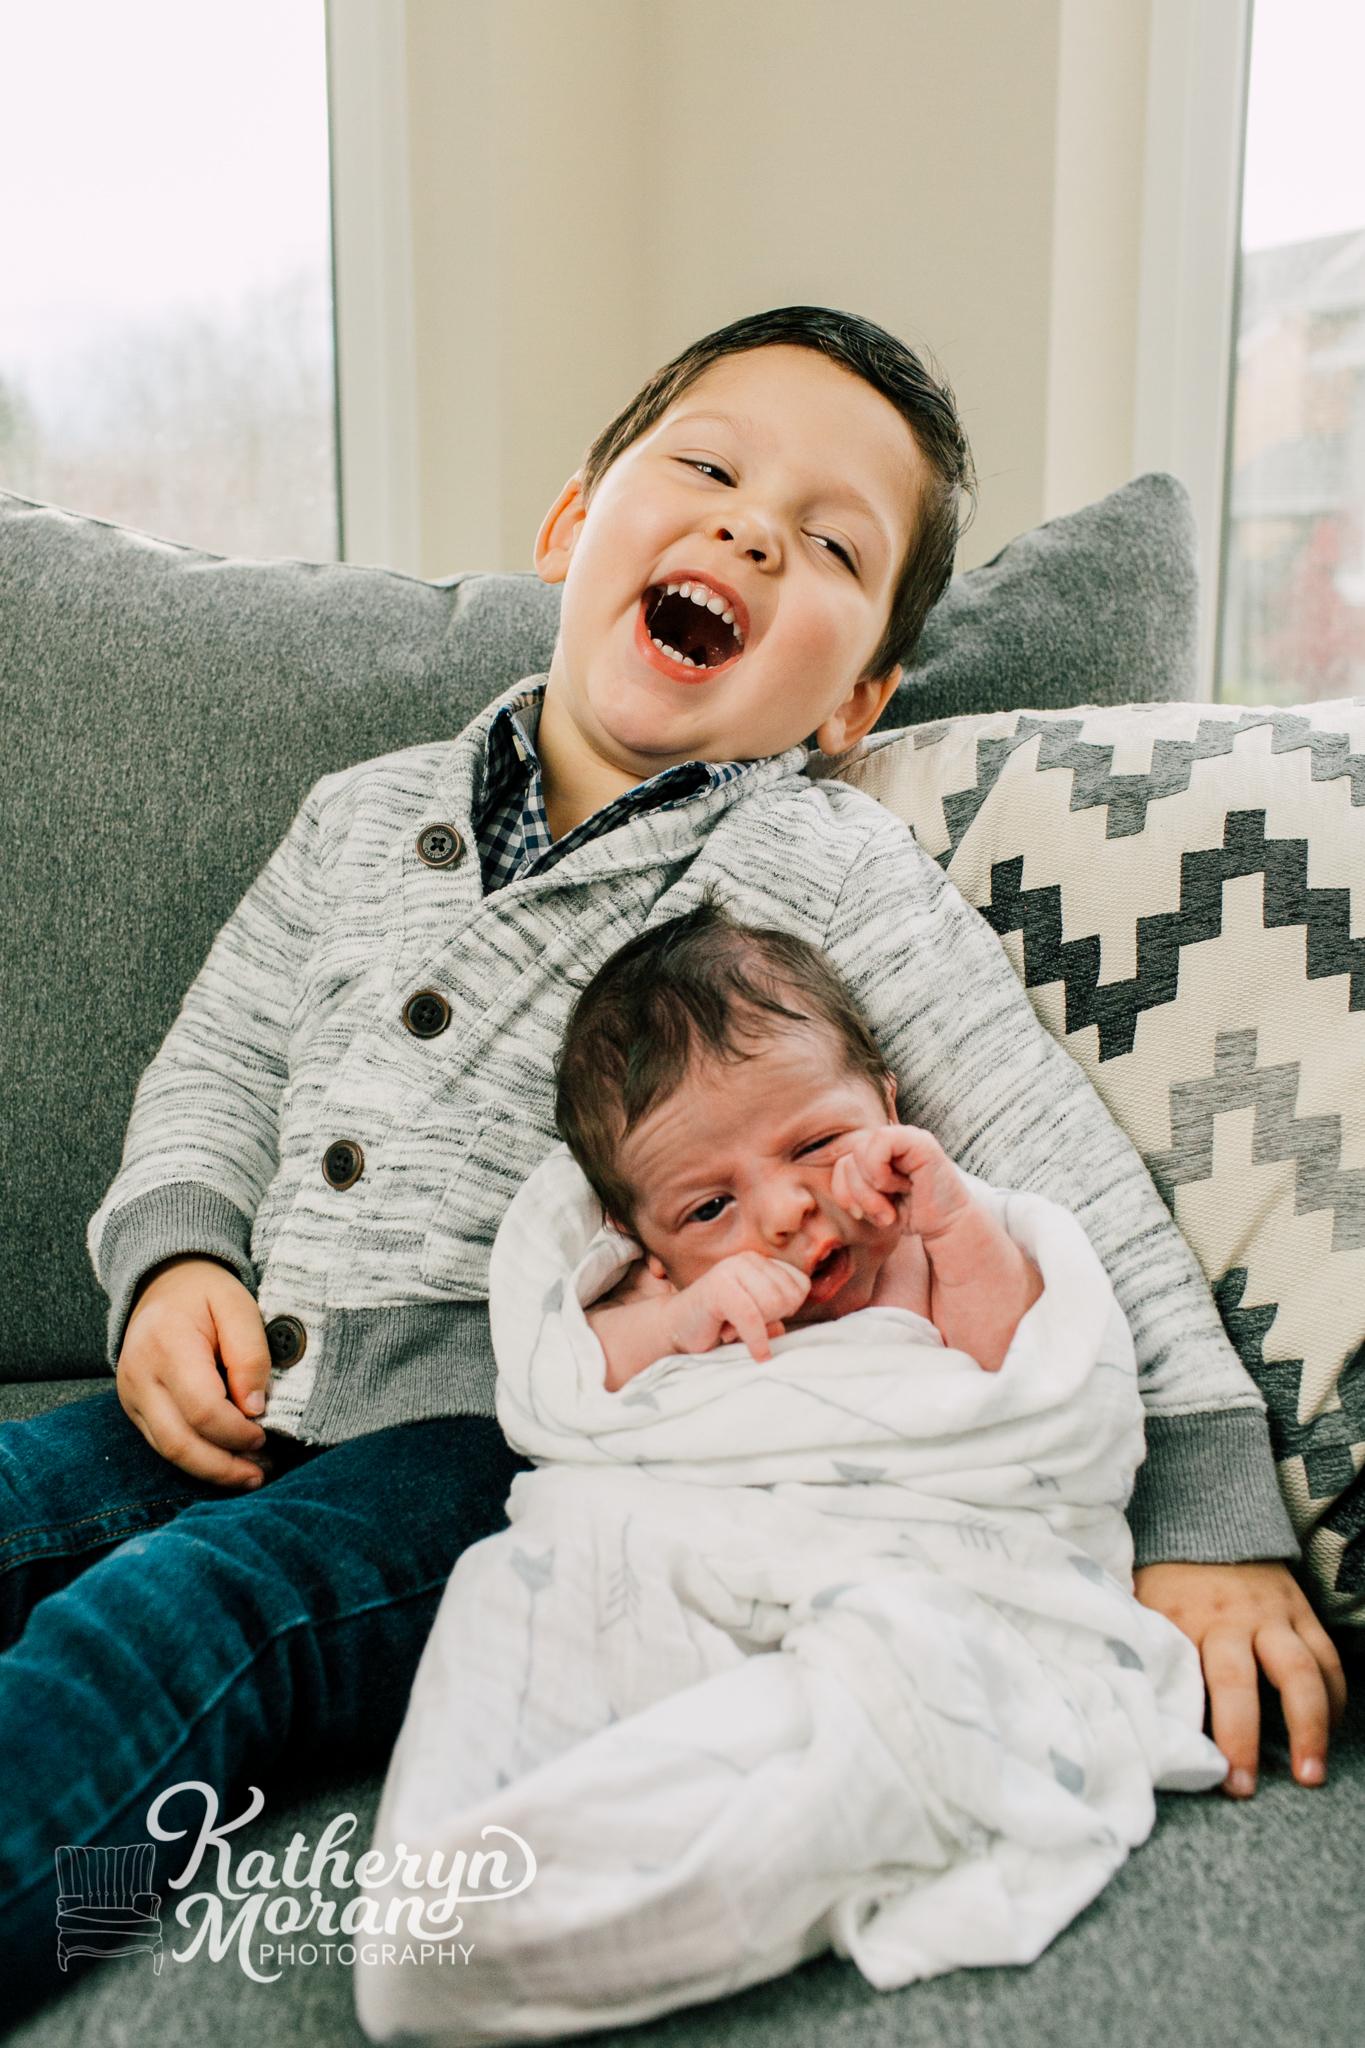 seattle-duvall-newborn-photographer-katheryn-moran-solorio-12.jpg